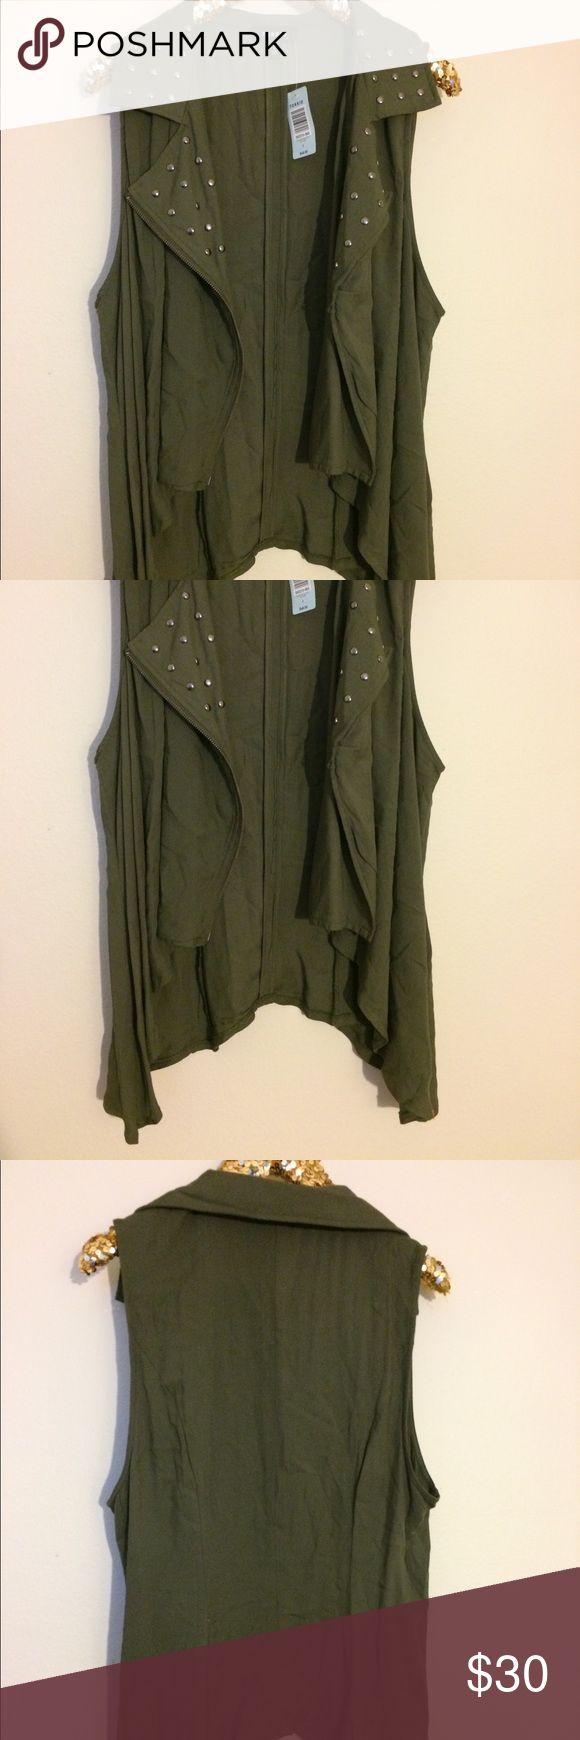 Torrid plus size cotton army green vest size 2 NWT Brand new. torrid Jackets & Coats Vests